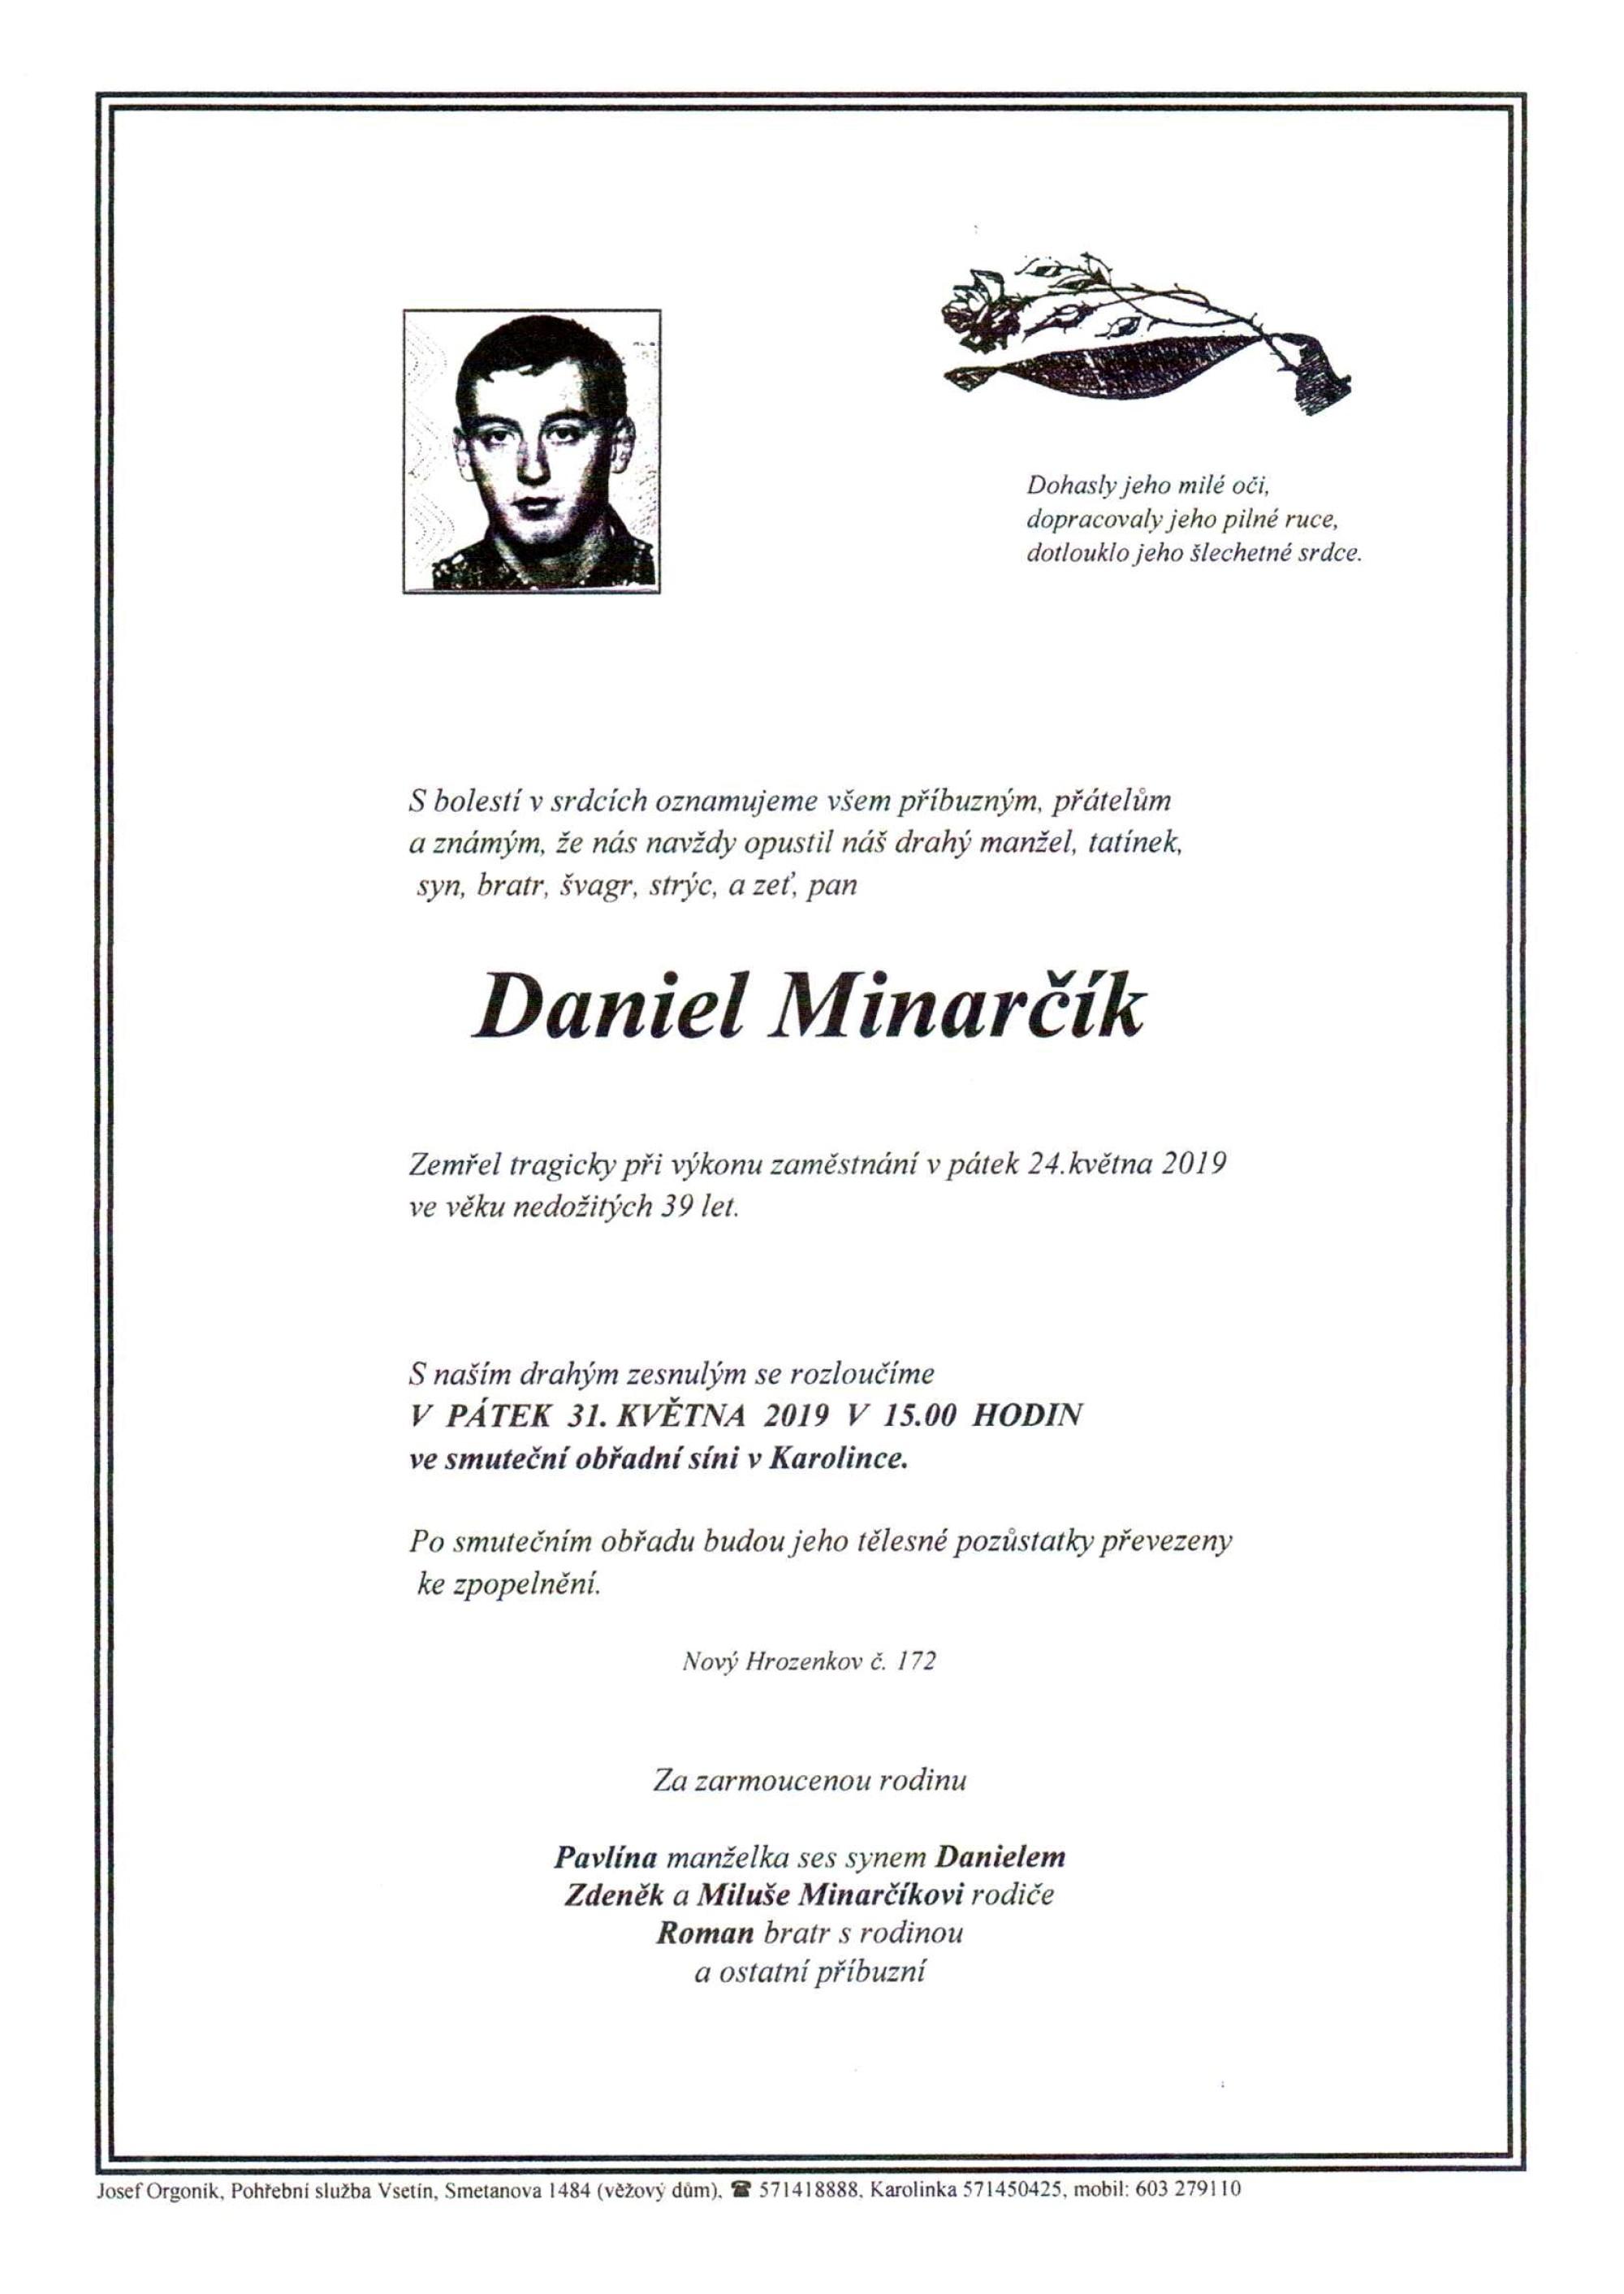 Daniel Minarčík